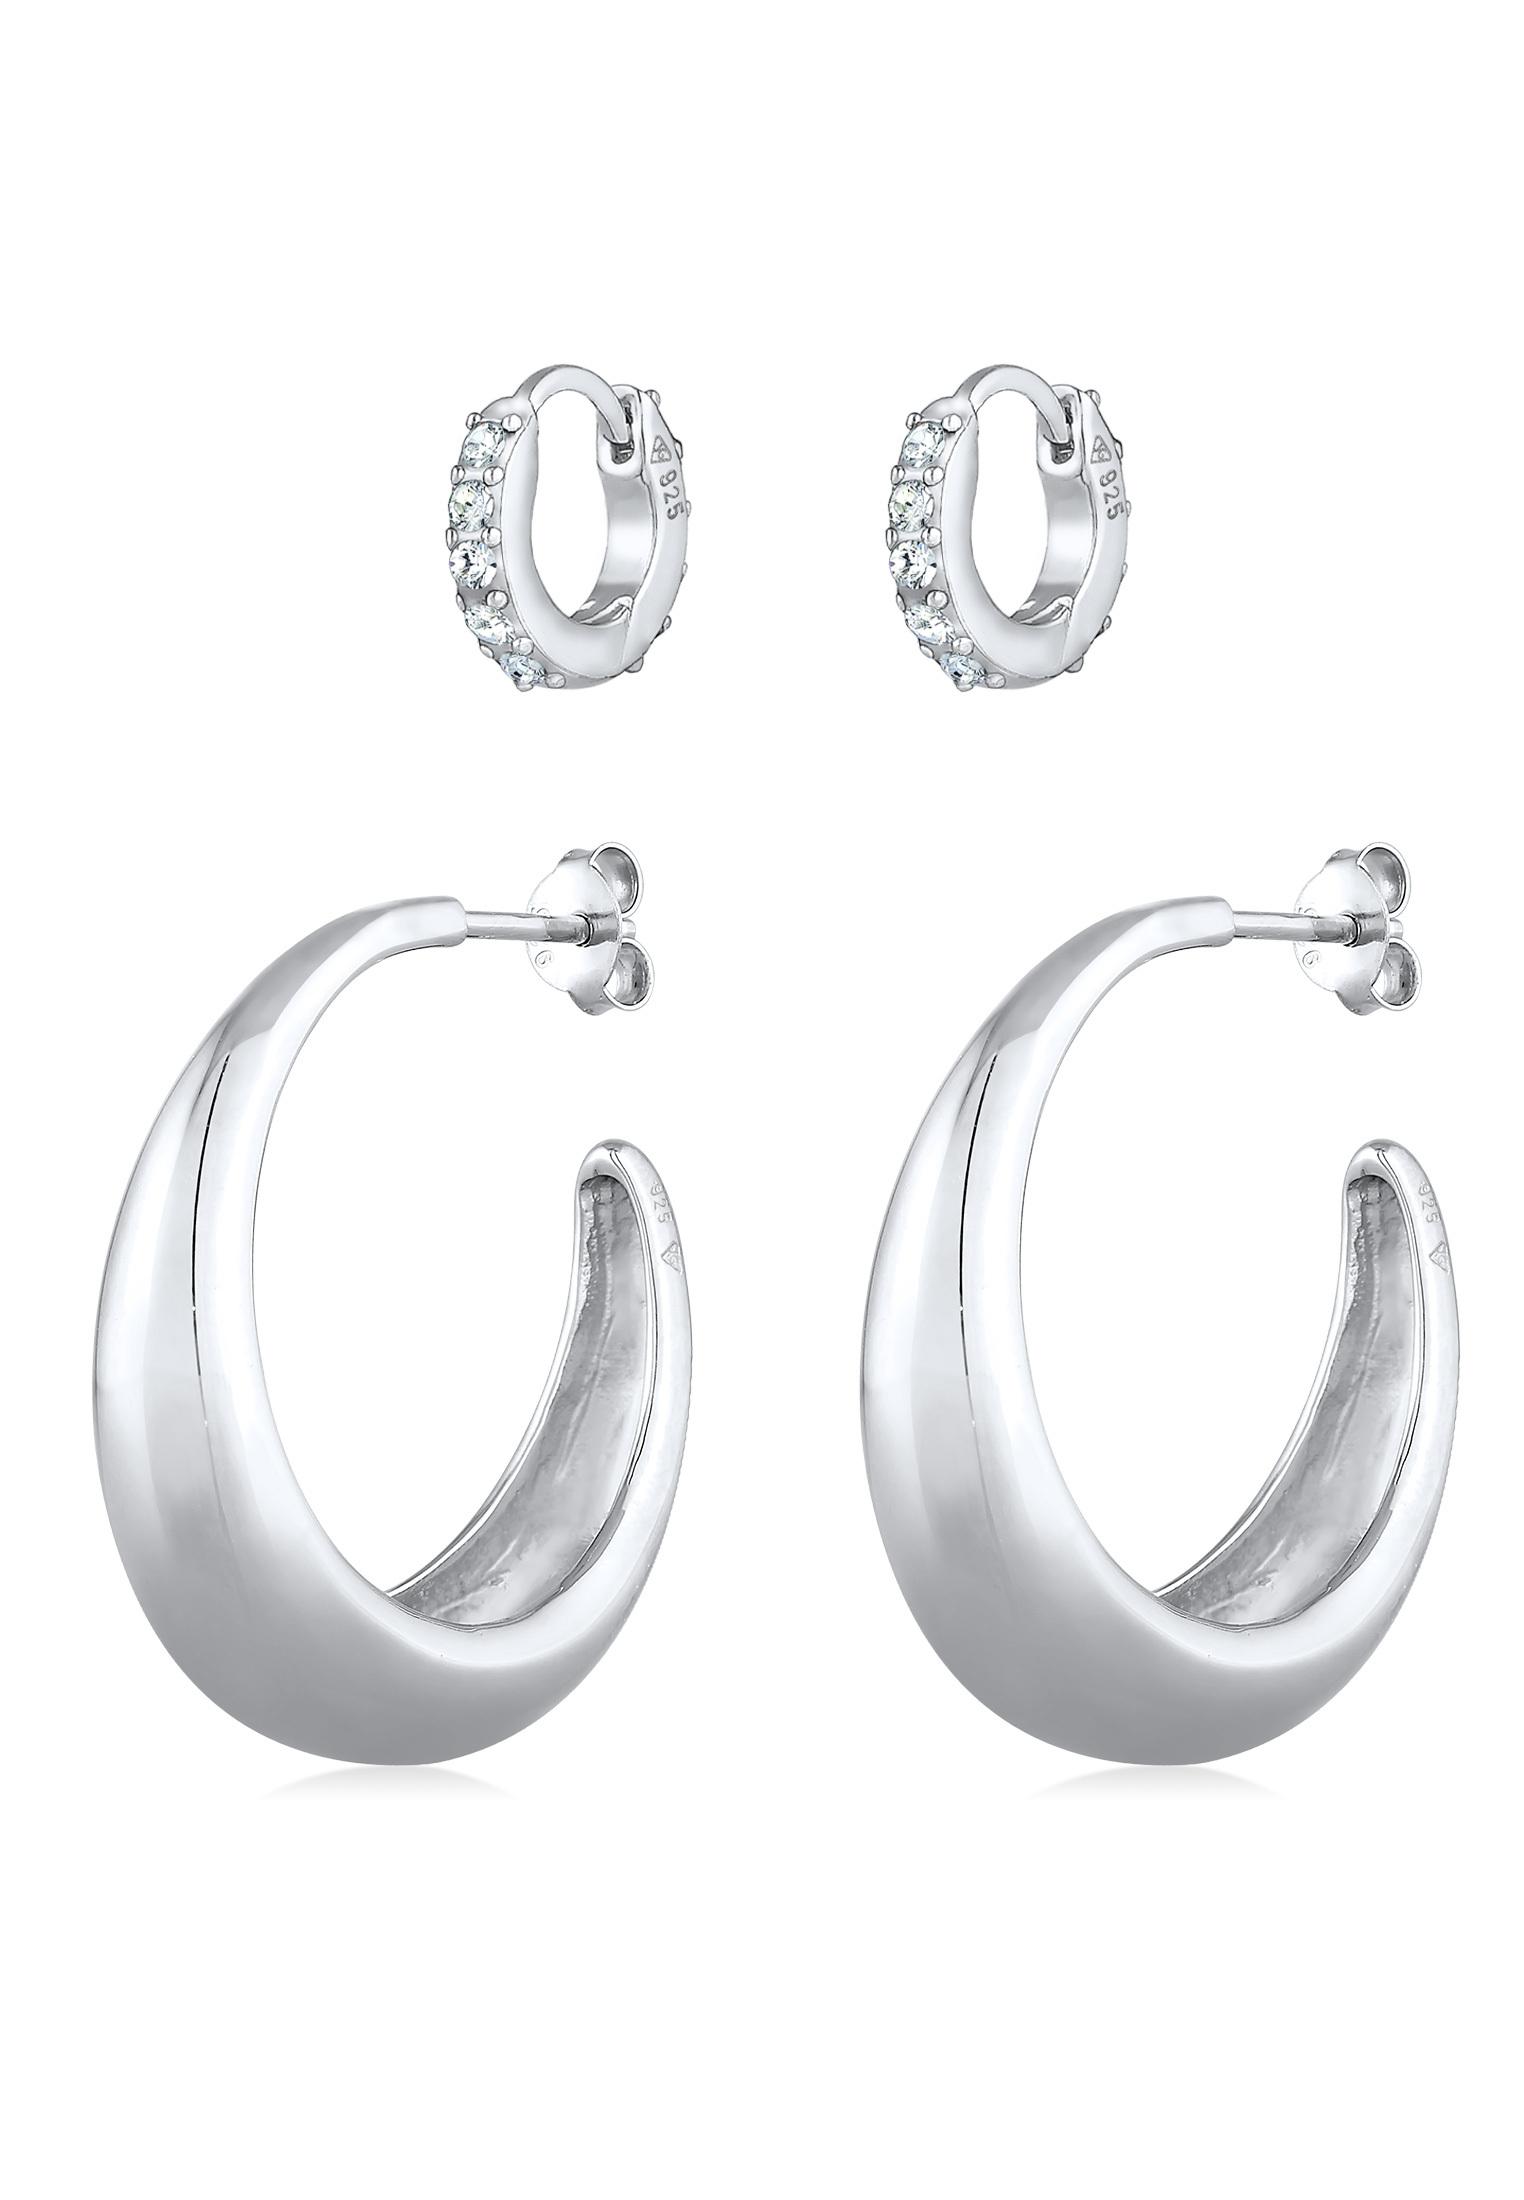 Ohrringset   Kristall ( Weiß )   925er Sterling Silber